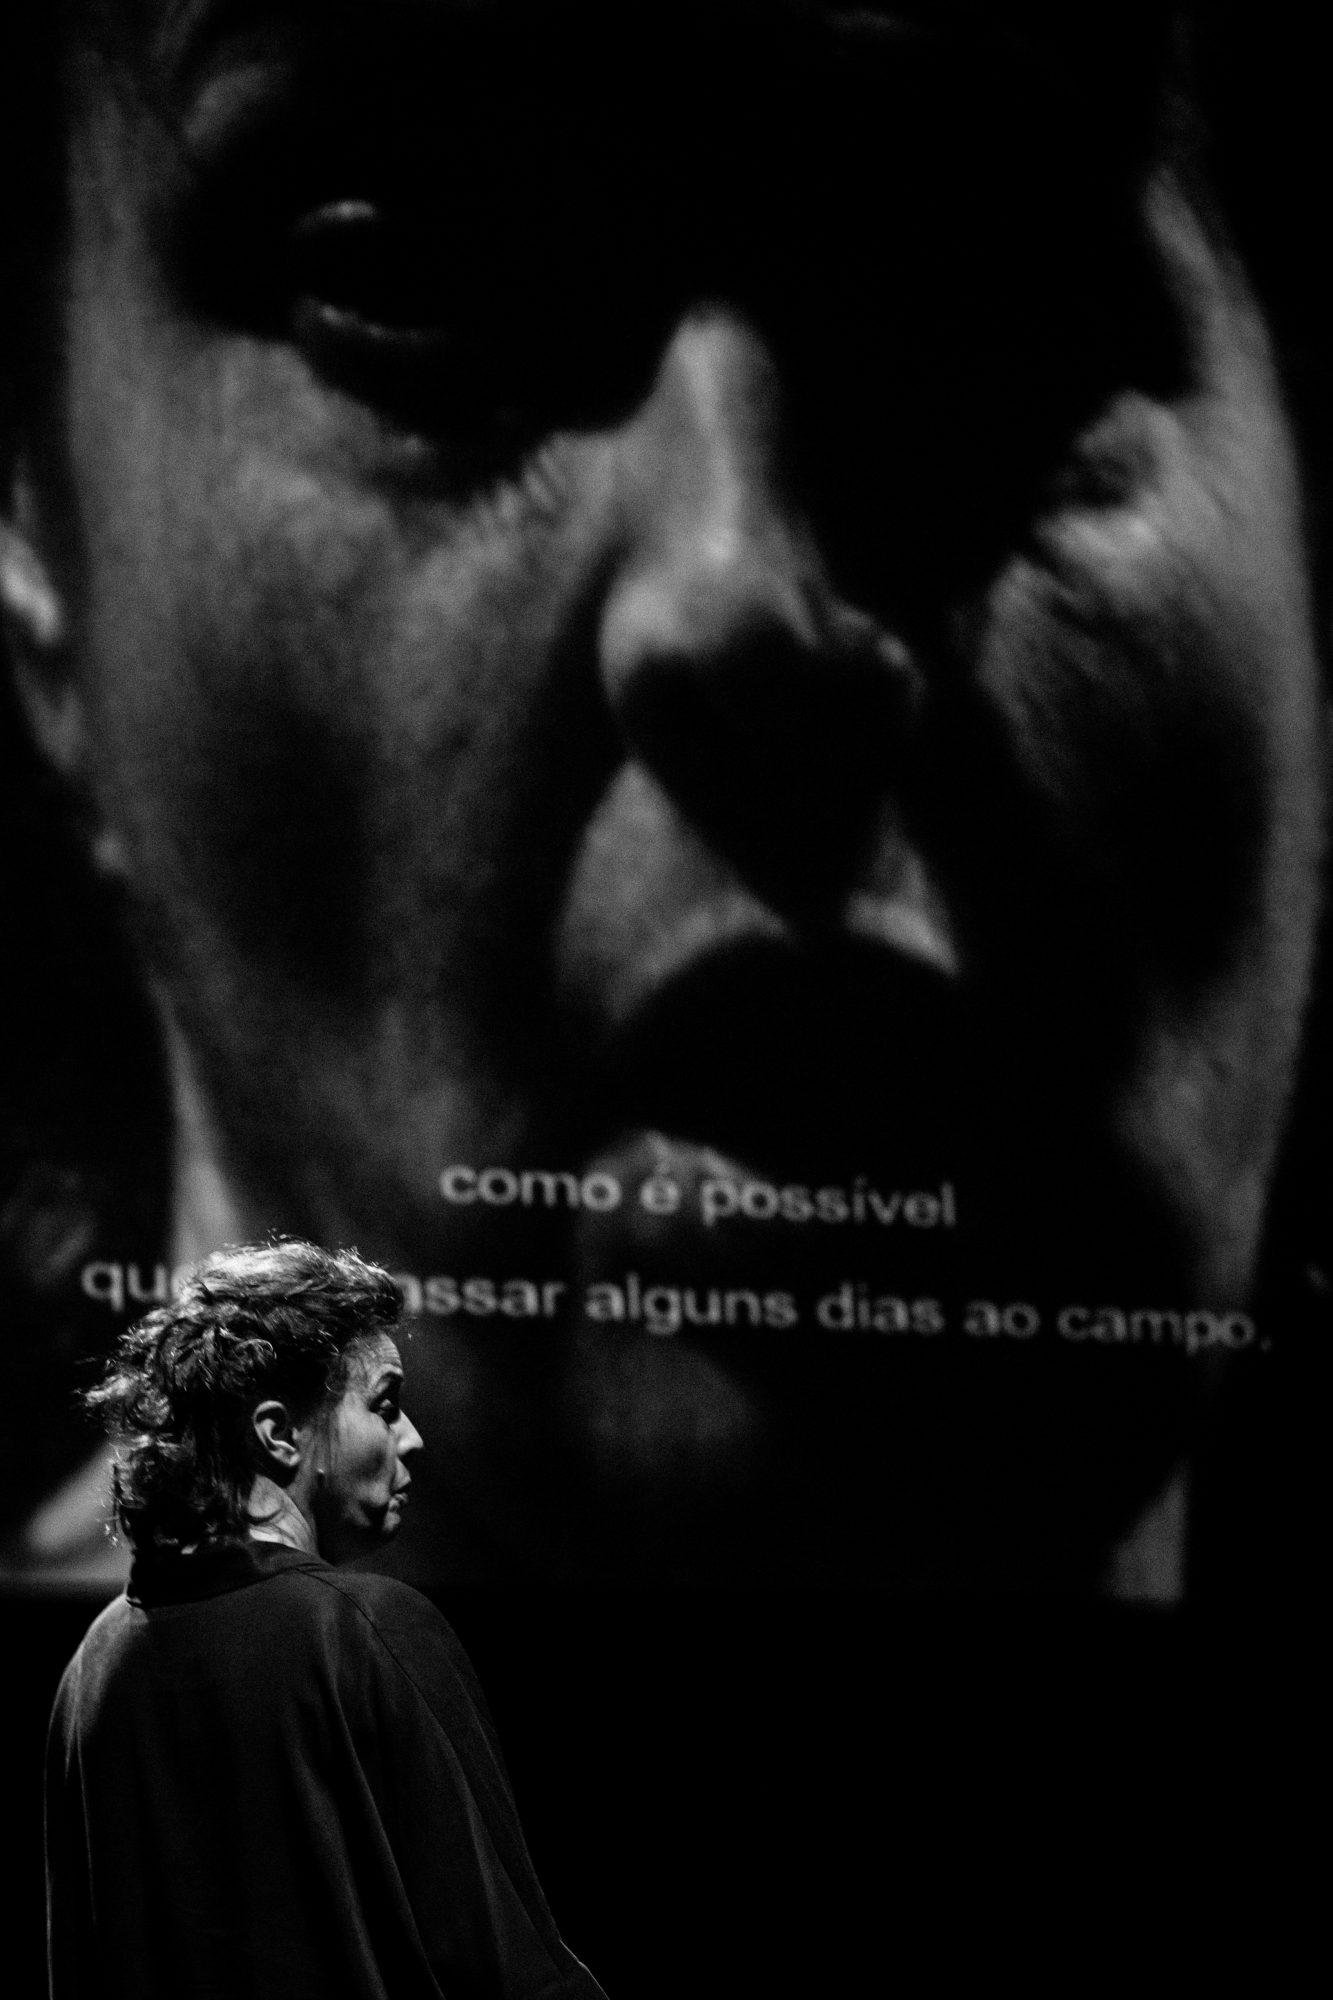 © Estelle Valente